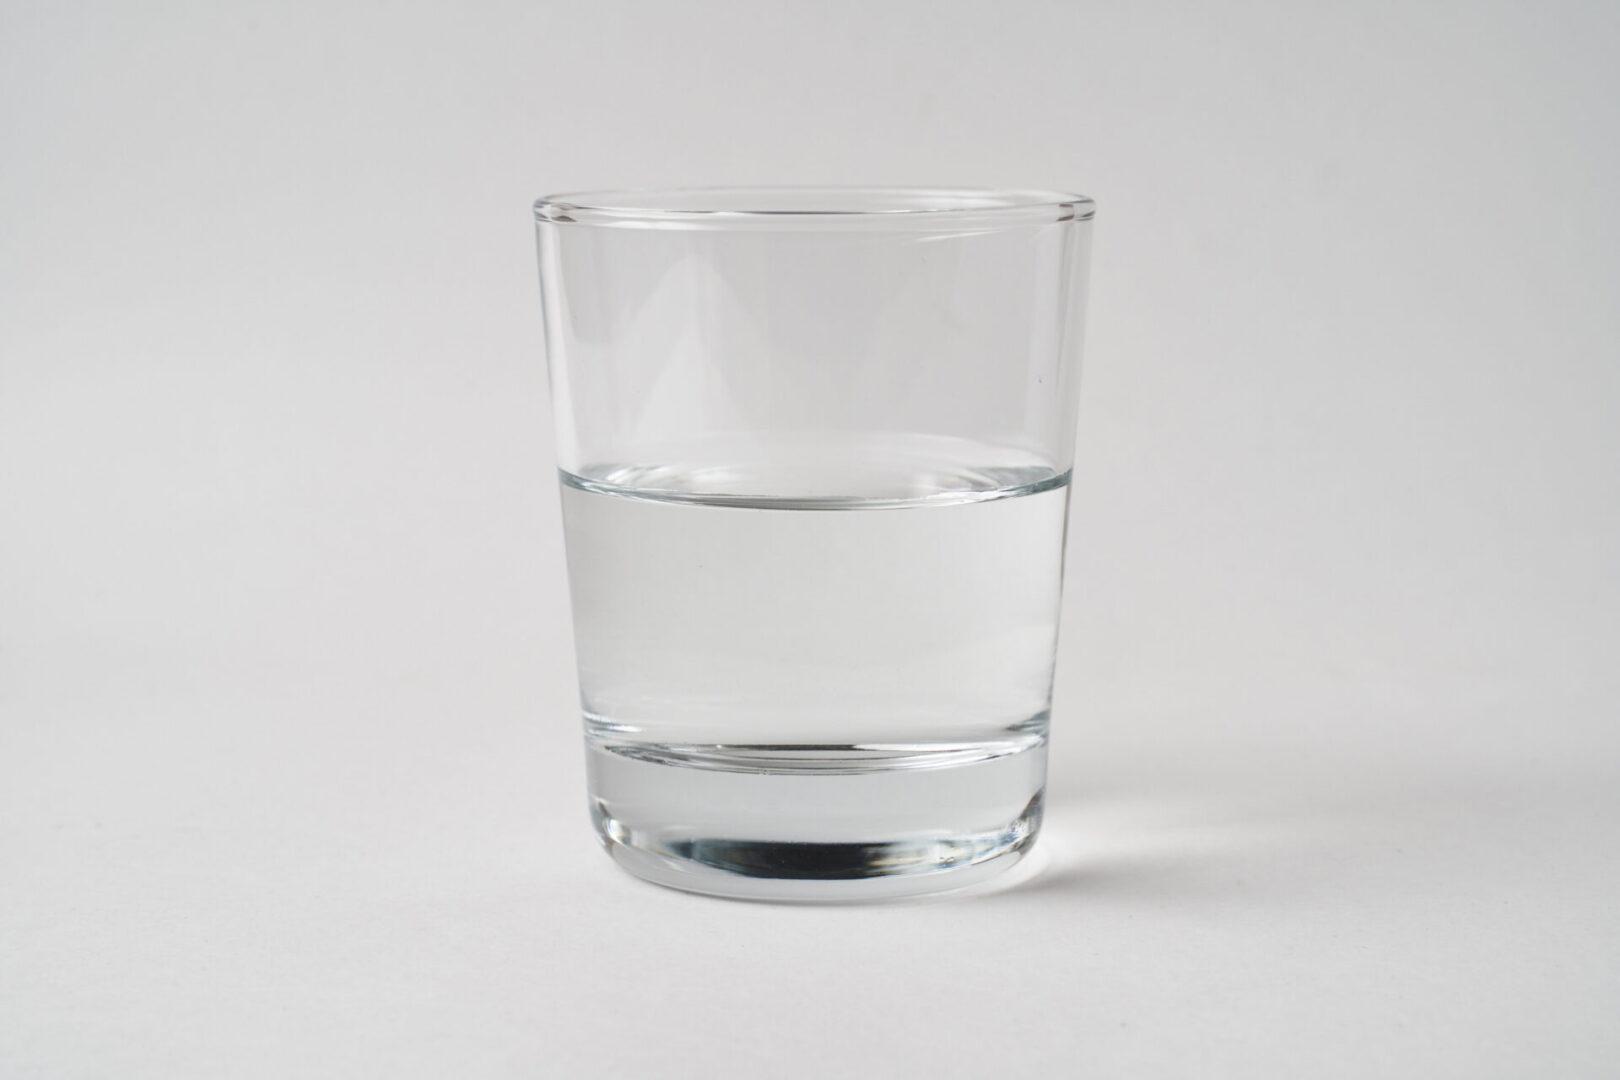 water glass half full